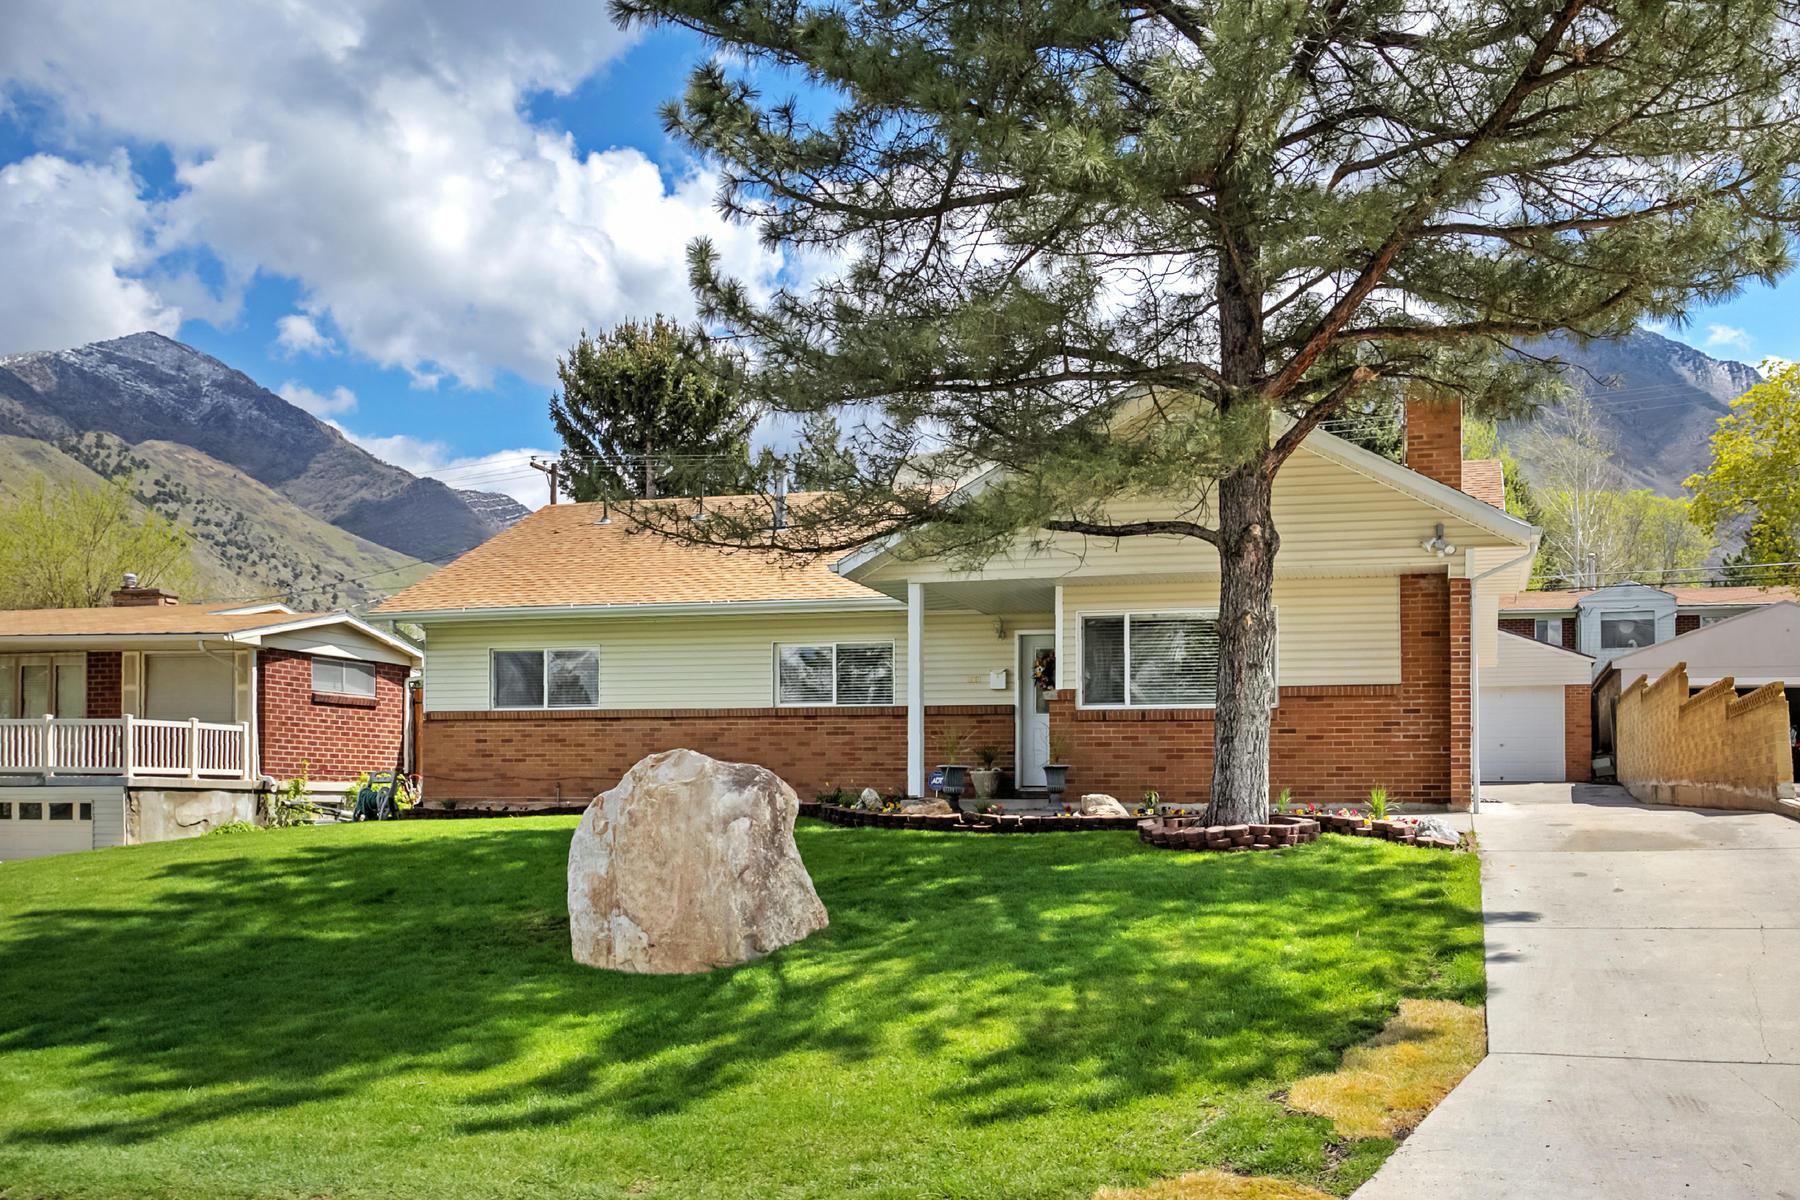 Villa per Vendita alle ore Rare Olympus Cove 6 Bedroom Rambler 4081 S Achilles Dr Salt Lake City, Utah, 84124 Stati Uniti